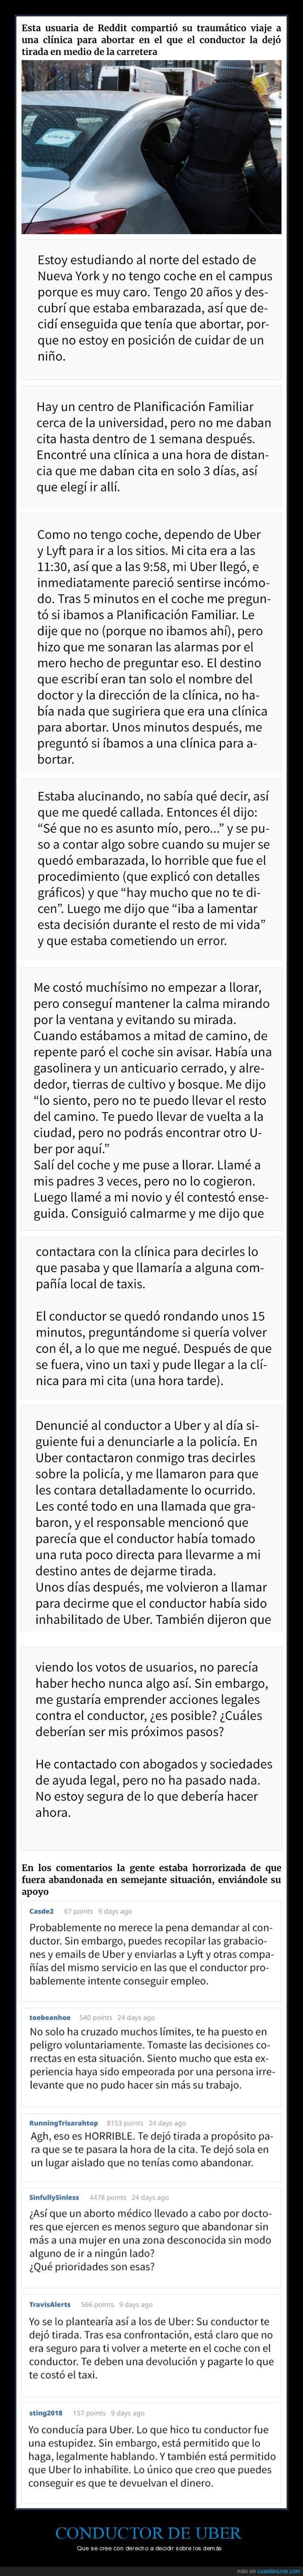 abortar,conductor,uber